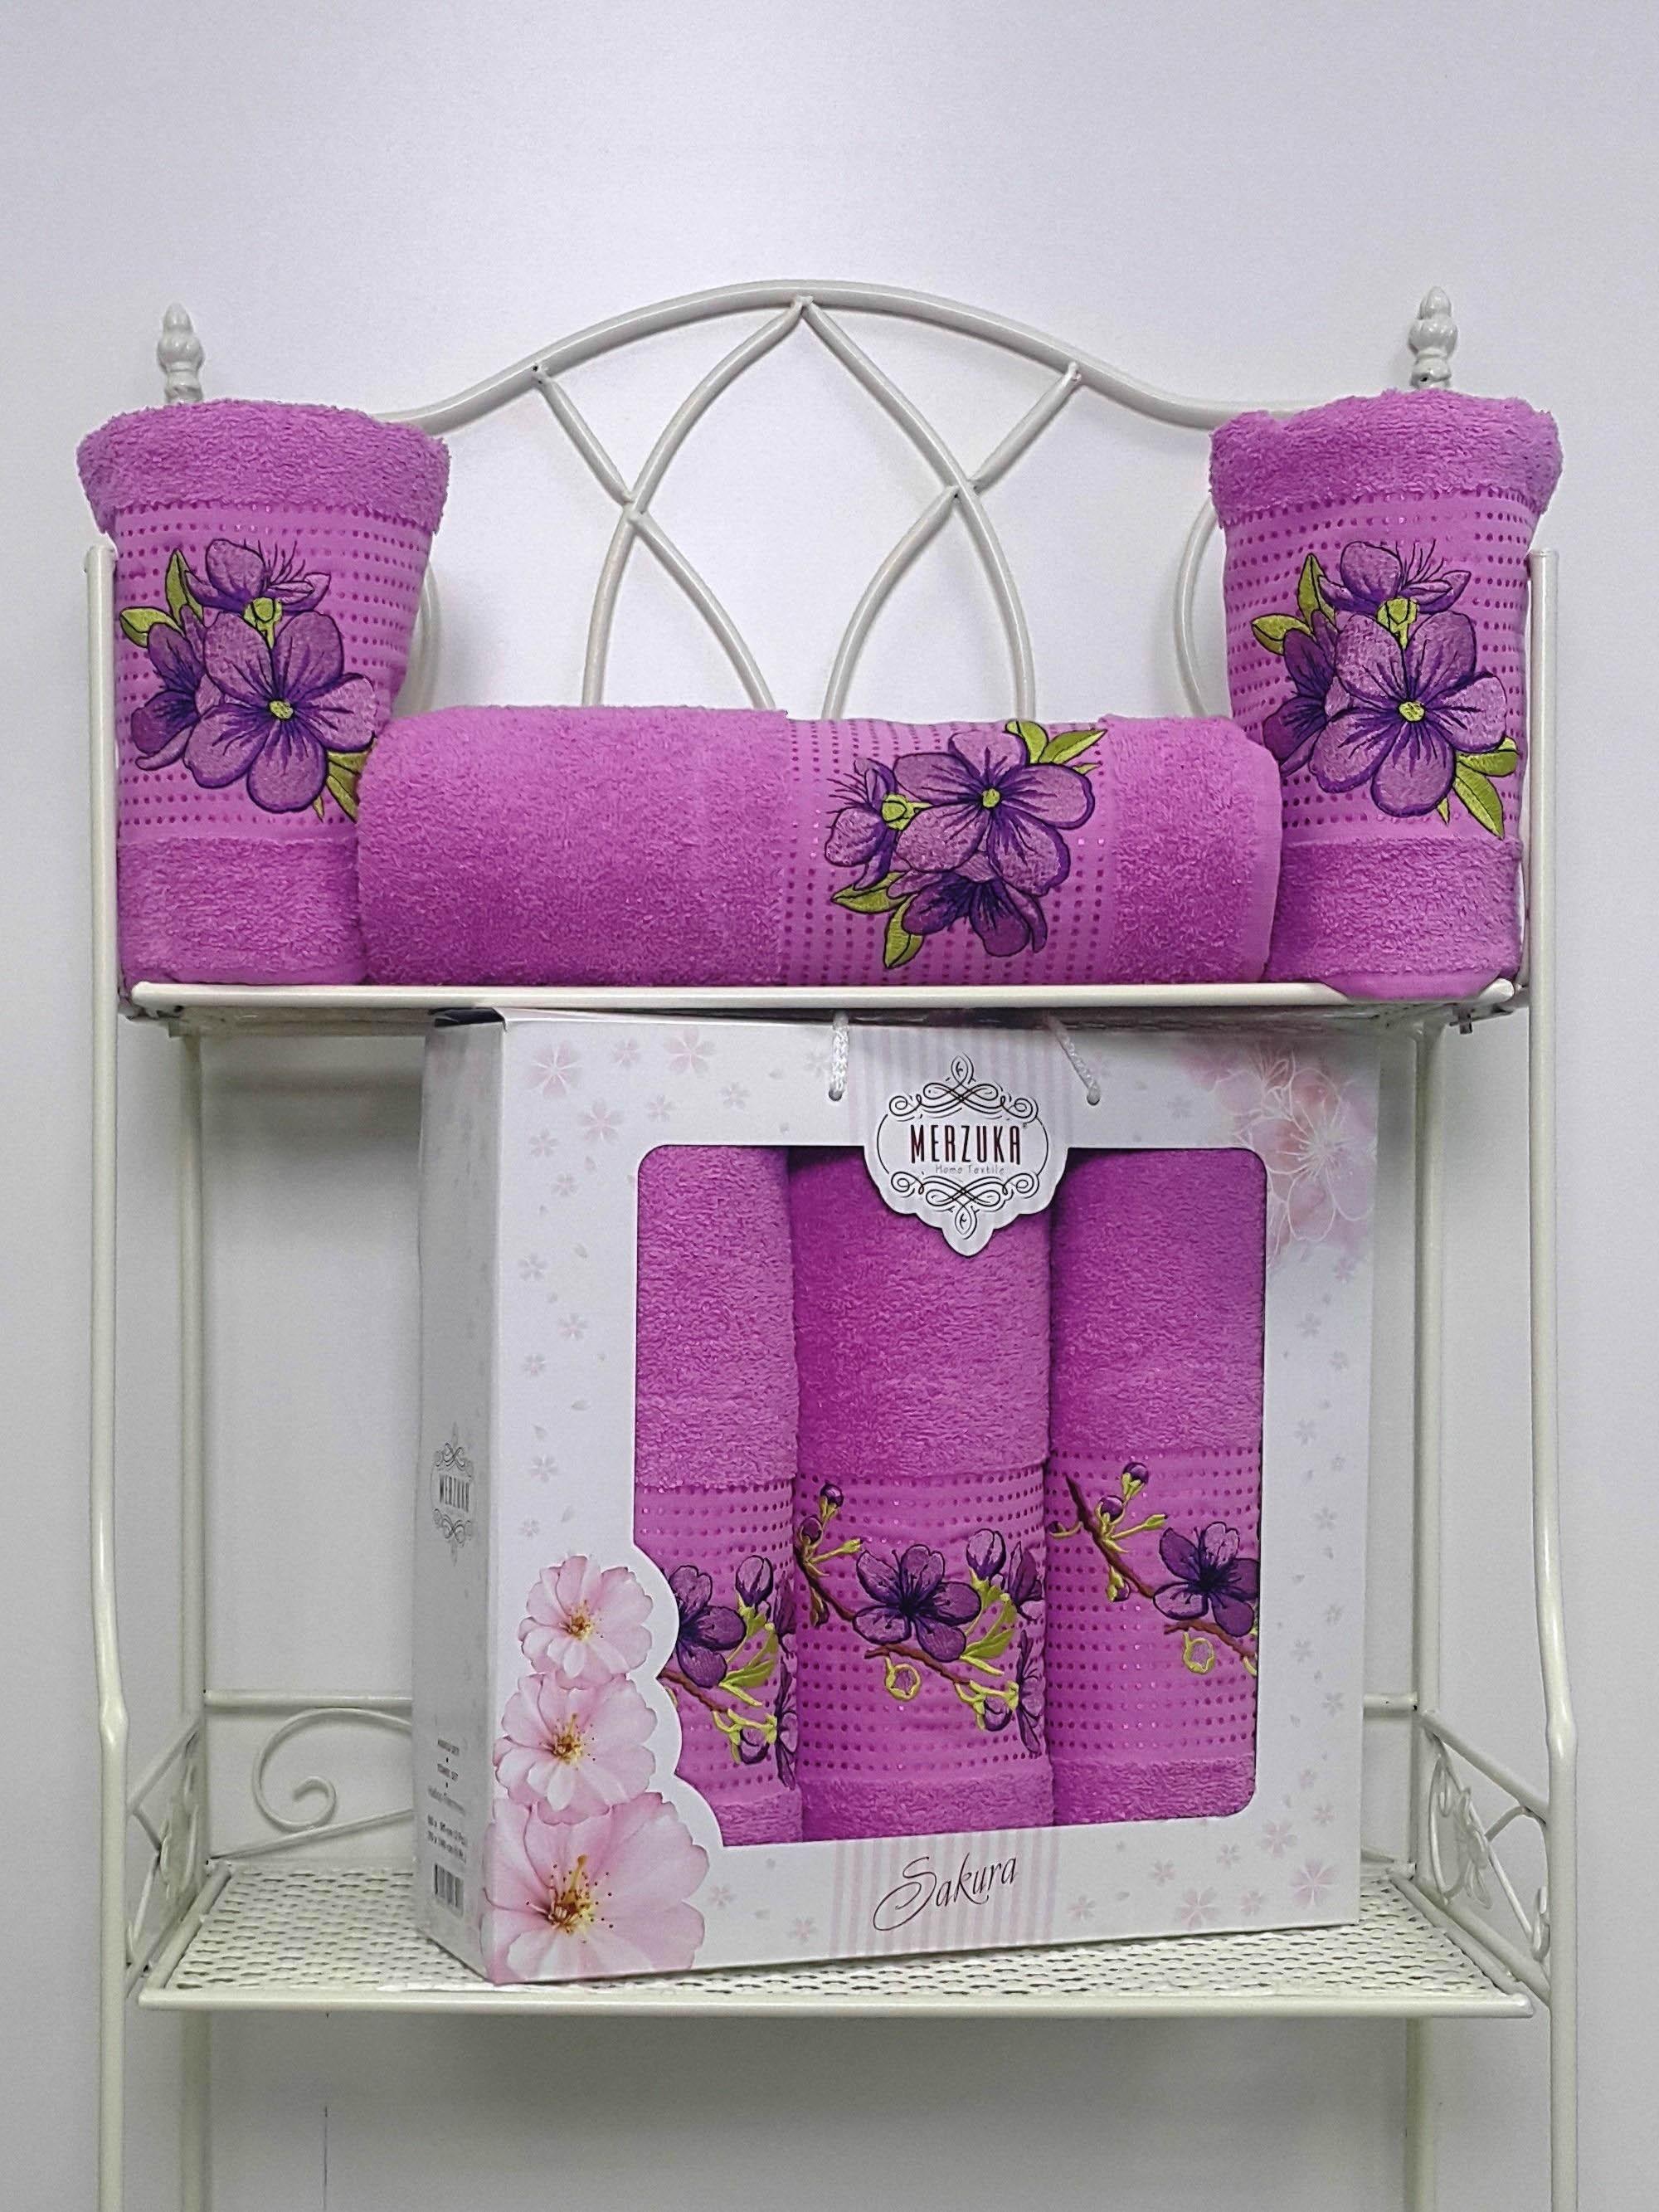 Полотенца Oran Merzuka Полотенце Sakura Цвет: Светло-Лиловый (Набор) набор из 3 полотенец merzuka sakura 50х90 2 70х140 8432 терракотовый